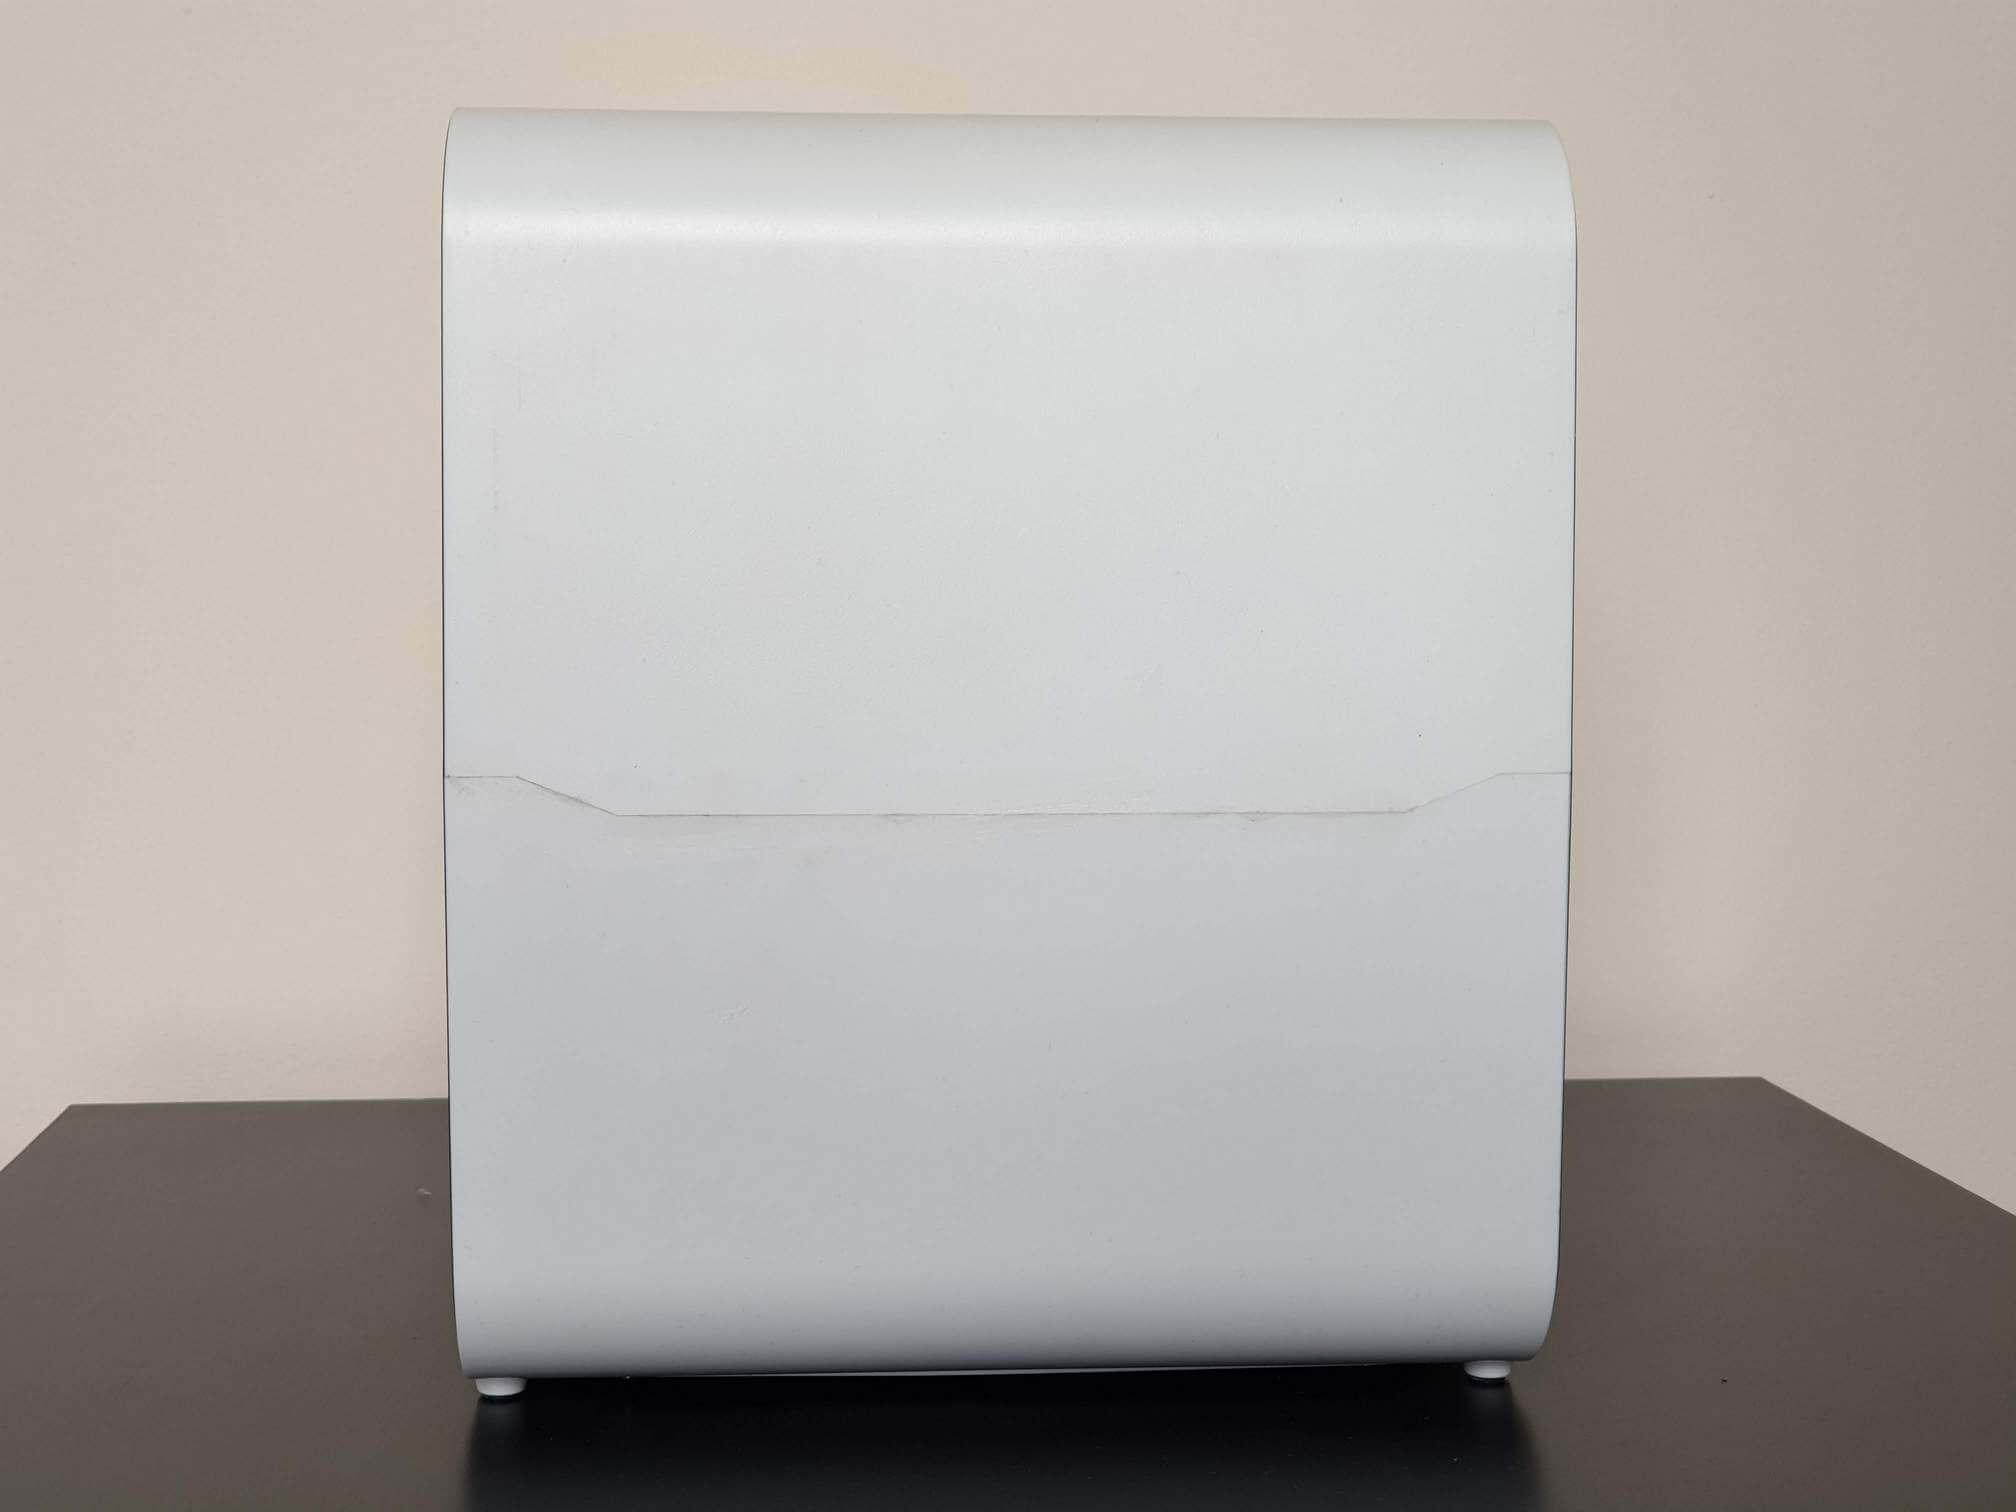 Longer 2 Mini Design 3 | Cube2 Mini Review - 3D Printer for Kids